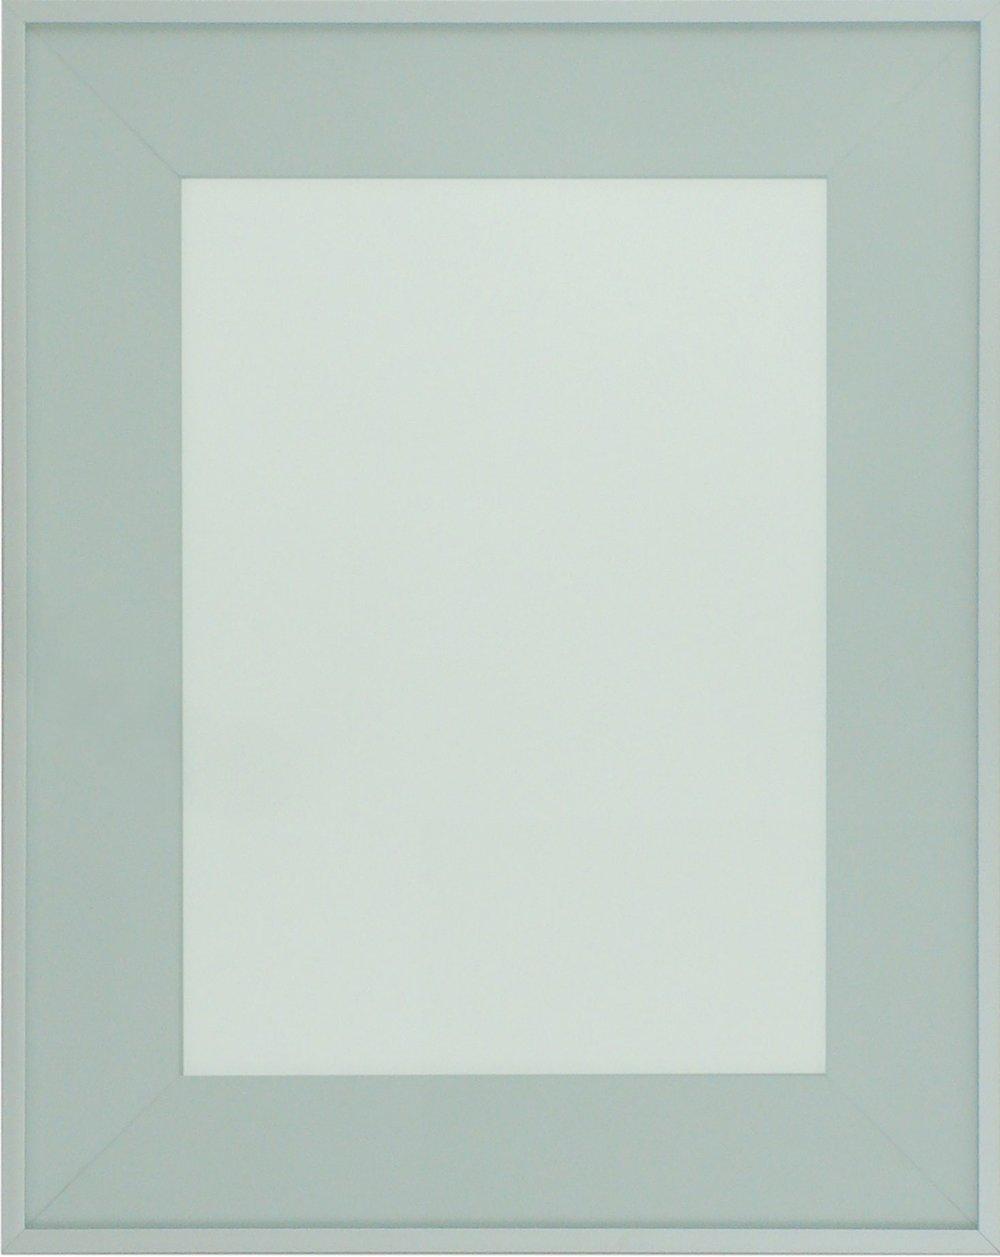 af002-sample-door-130-lg-1.jpg